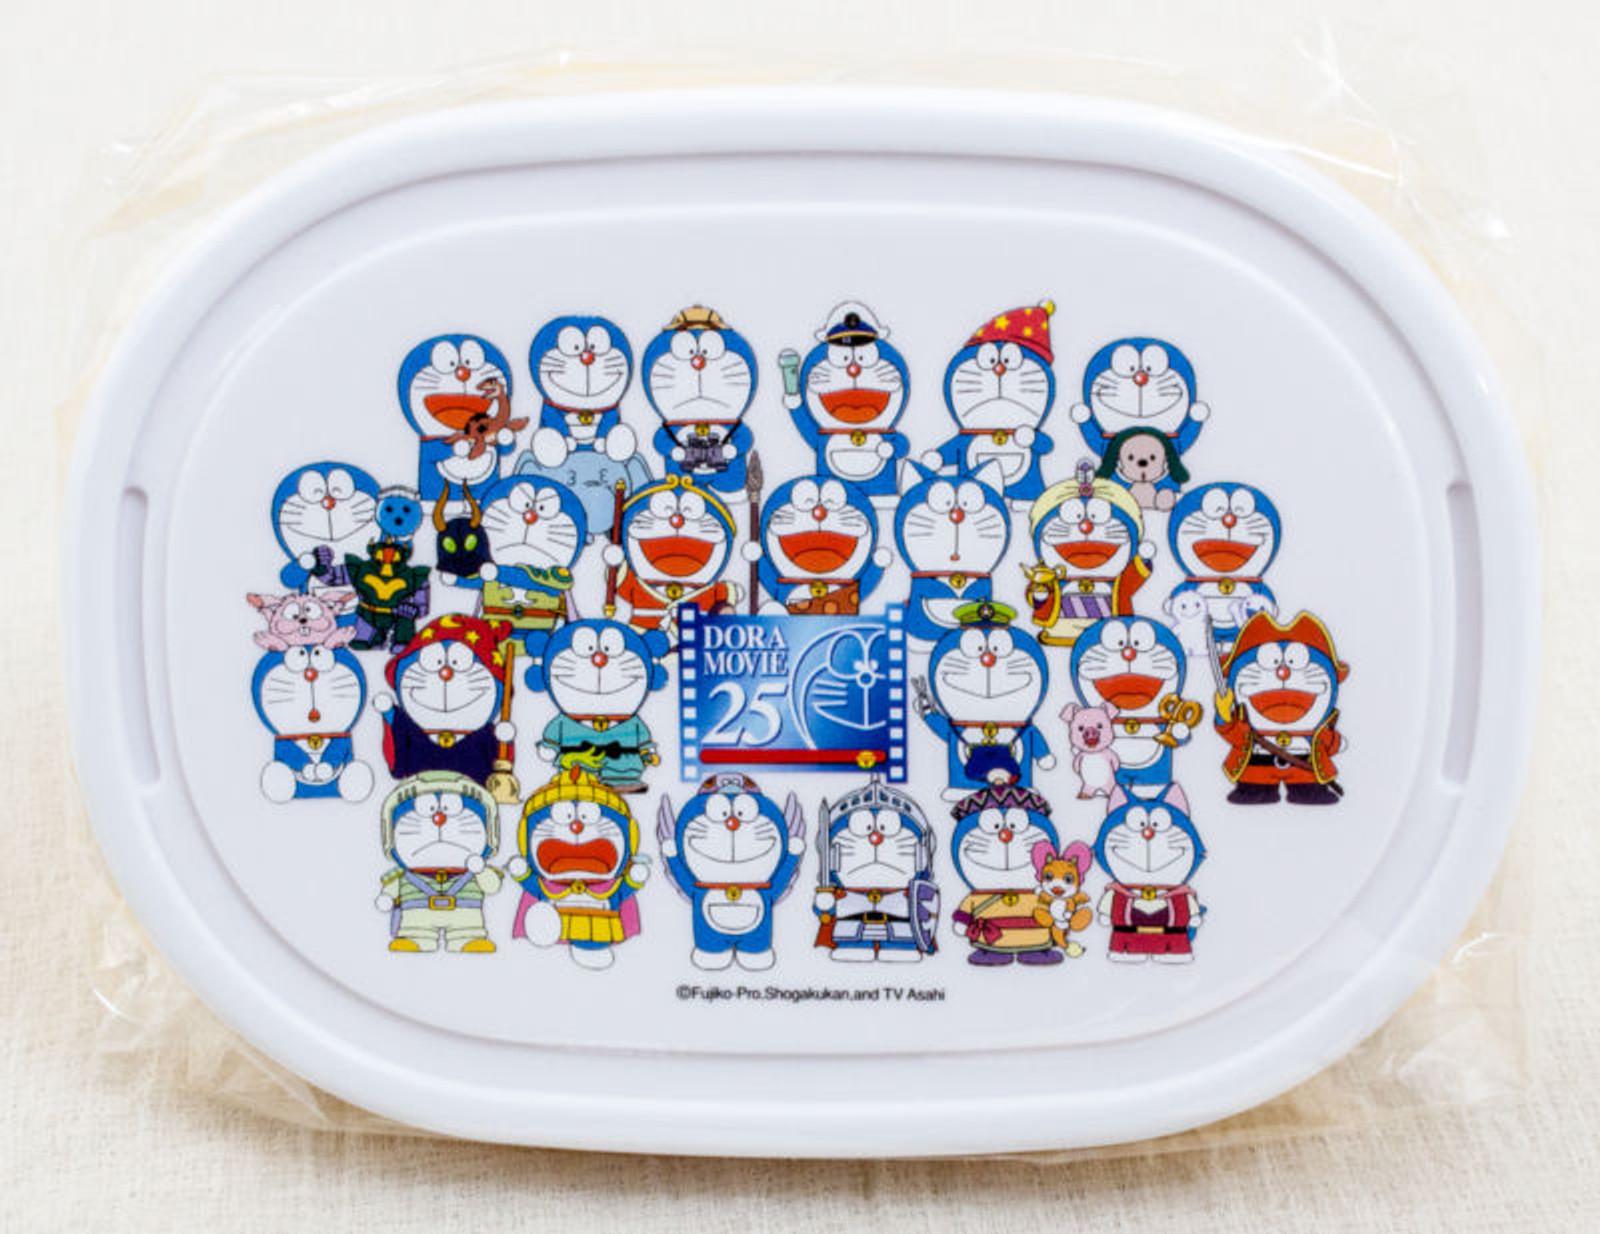 Doraemon Lunch Box w/Bandana 25 Dora Movie Character JAPAN ANIME MANGA FUJIO